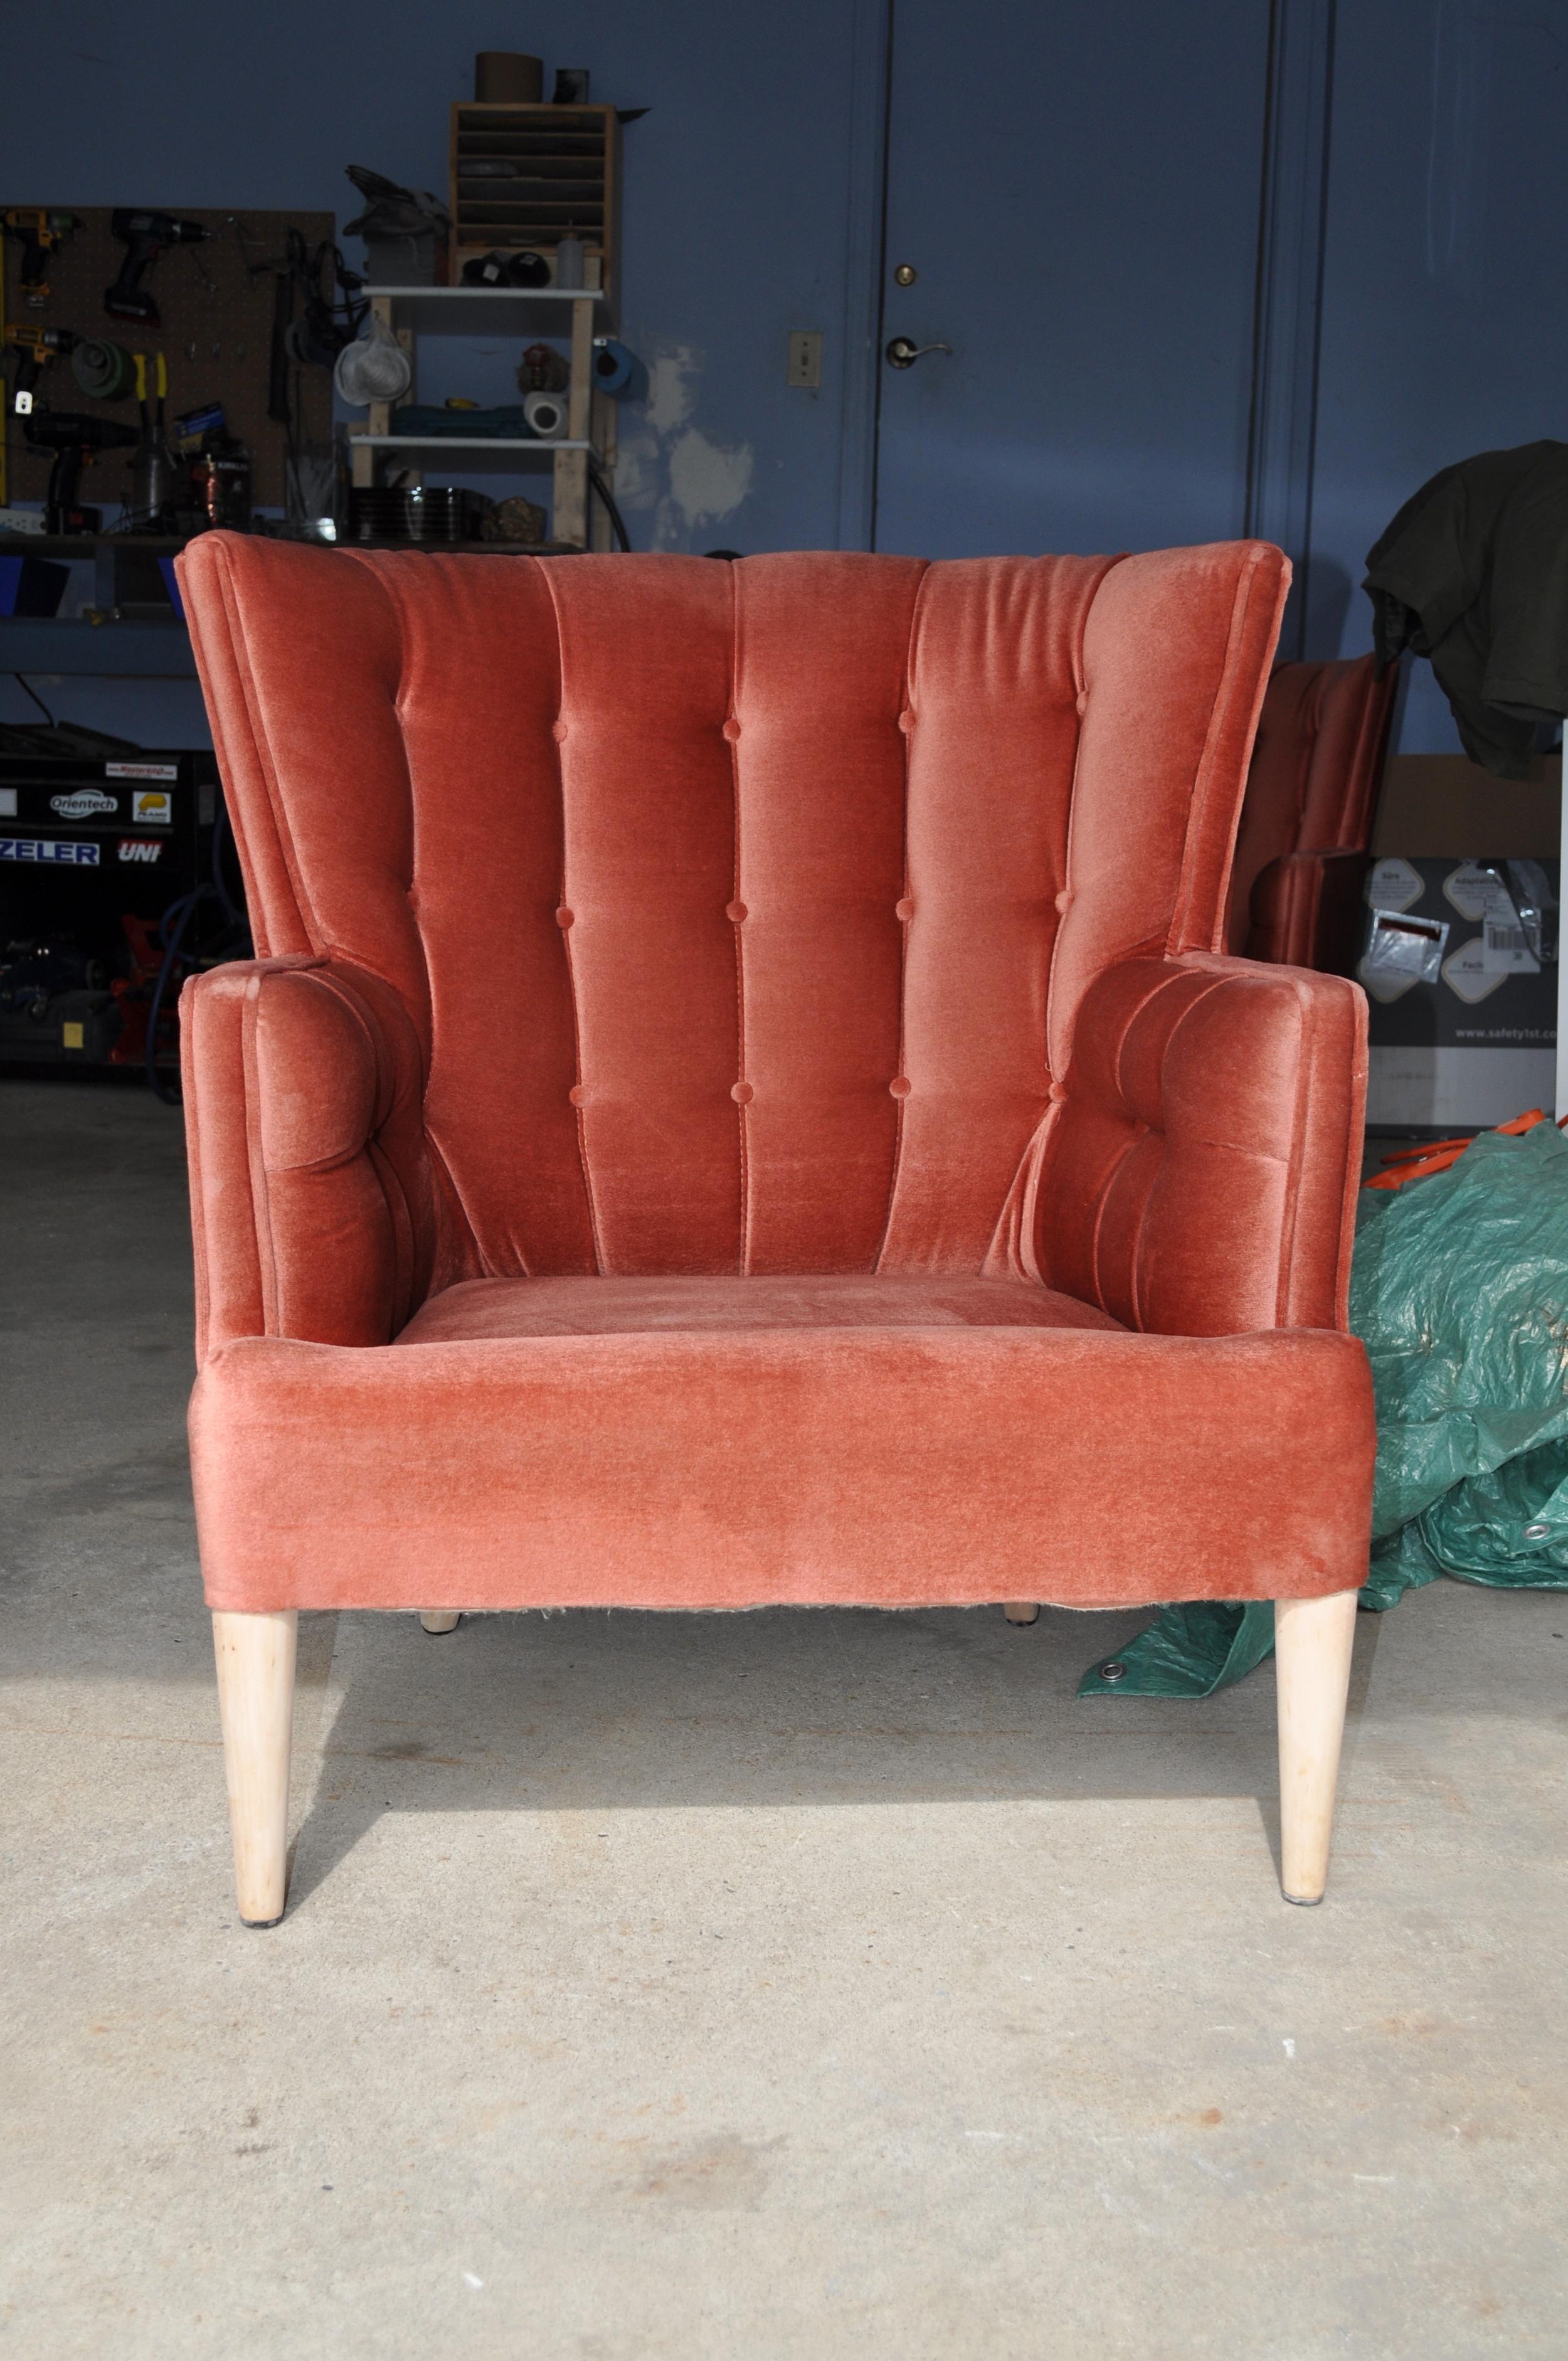 Chair Legs Sanding complete